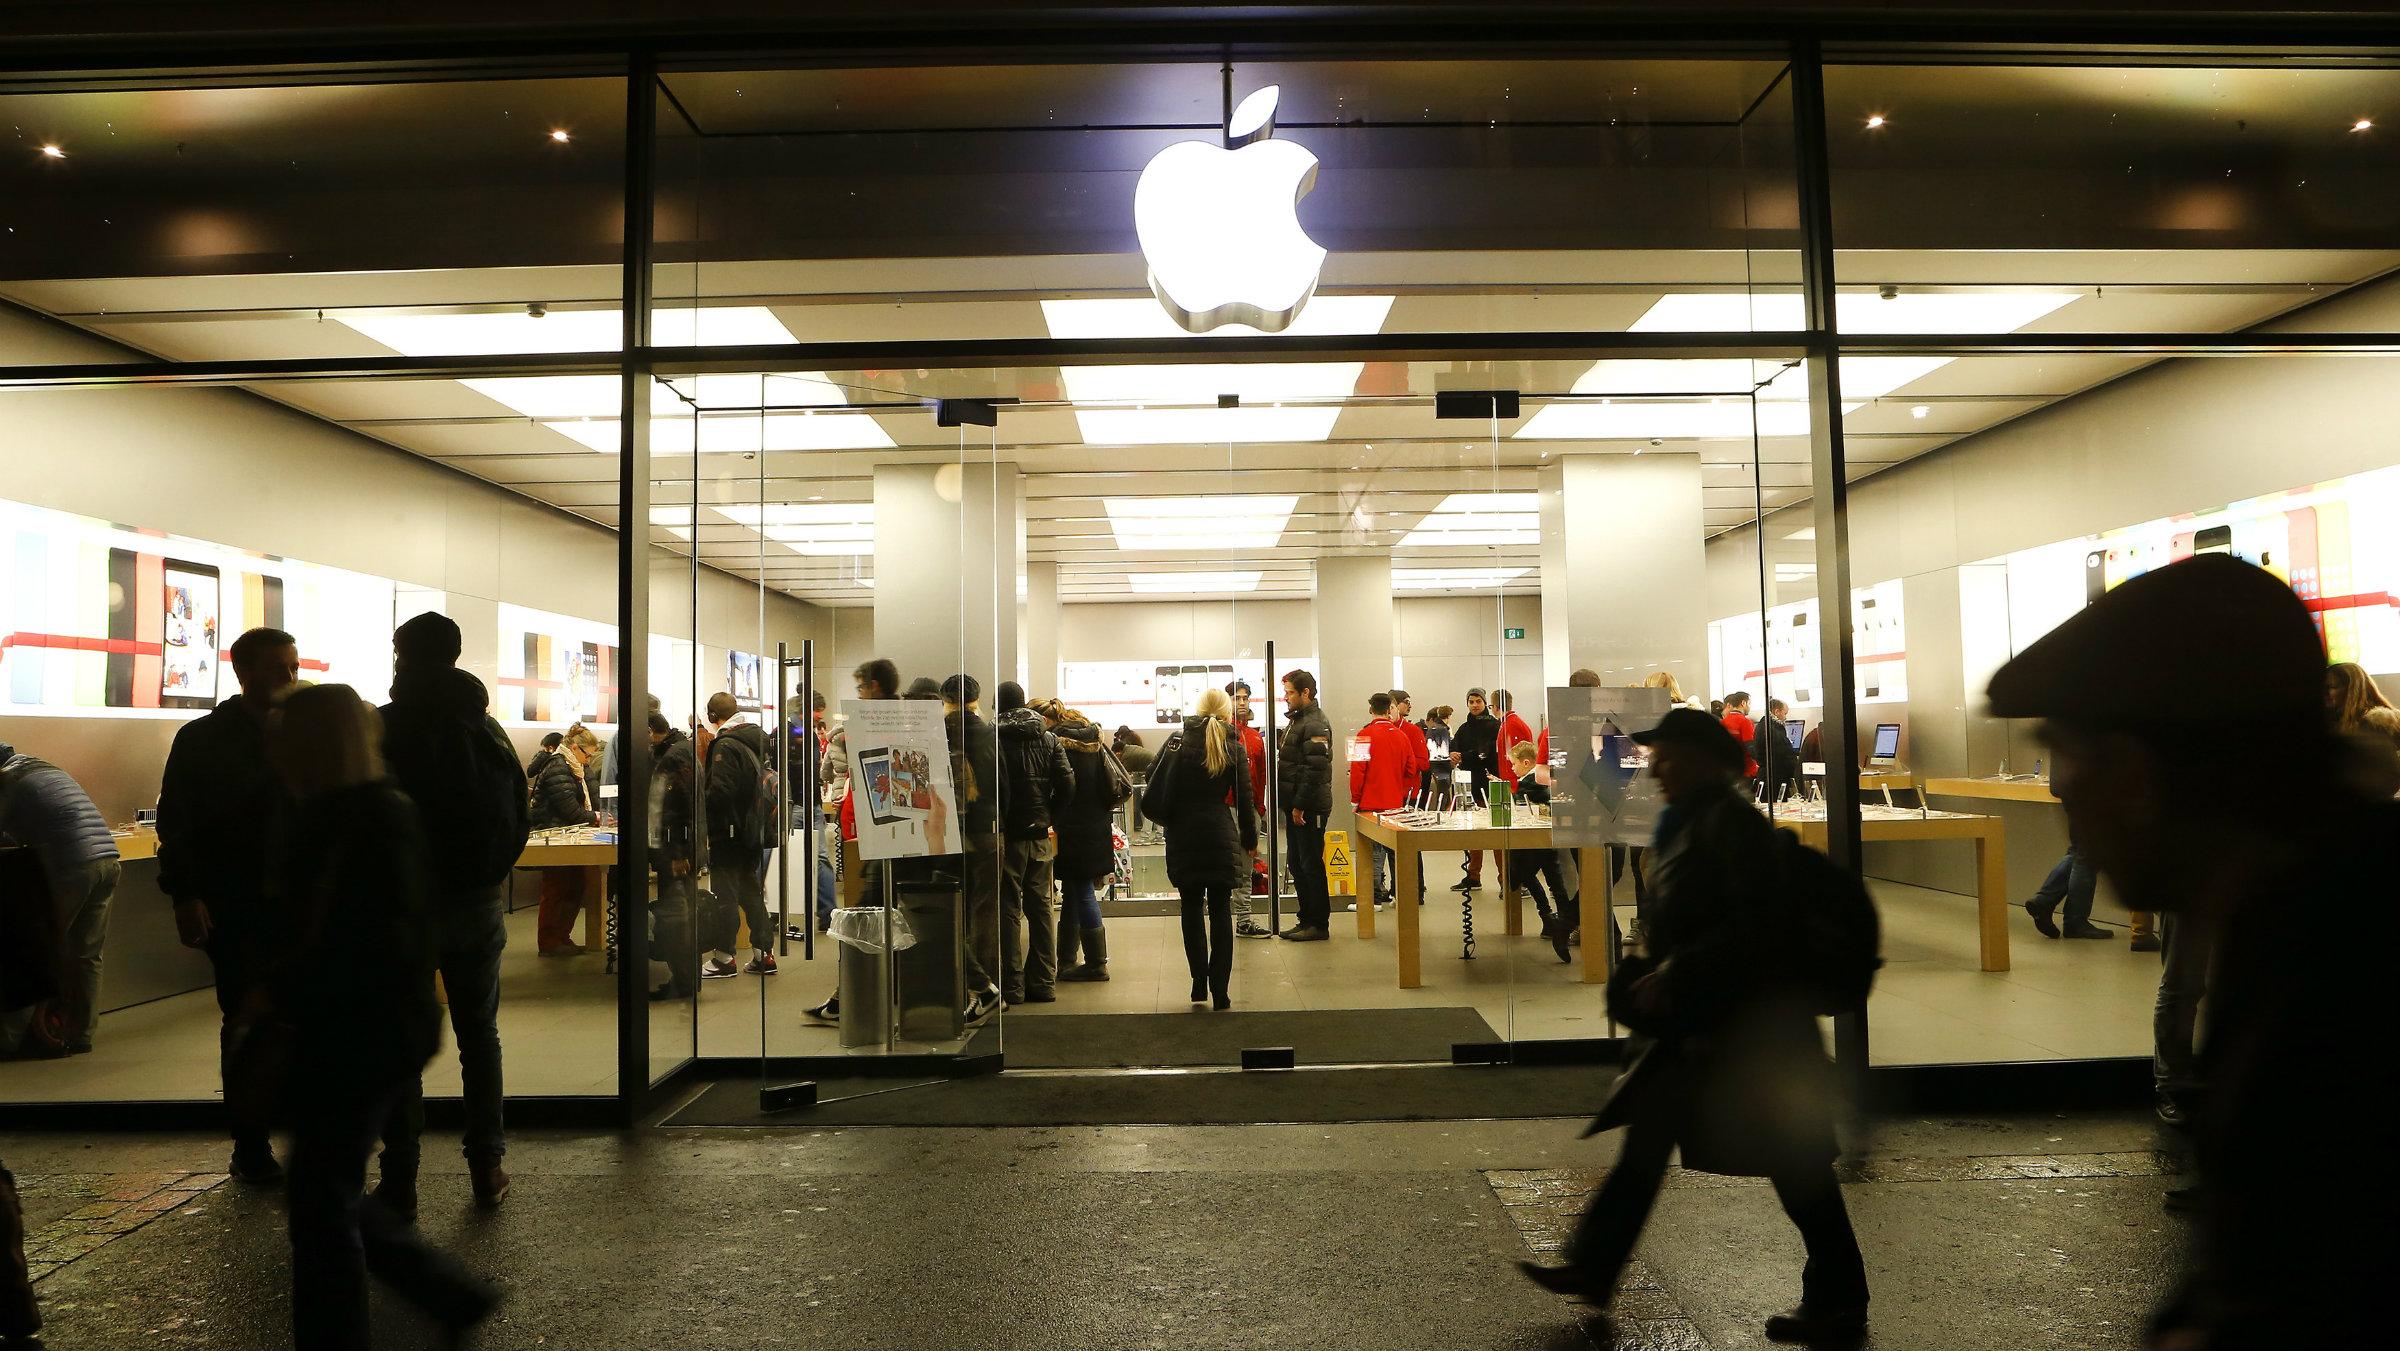 People walk past an Apple Store at the Bahnhofstrasse shopping street in Zurich December 19, 2013. REUTERS/Arnd Wiegmann (SWITZERLAND - Tags: SCIENCE TECHNOLOGY BUSINESS)